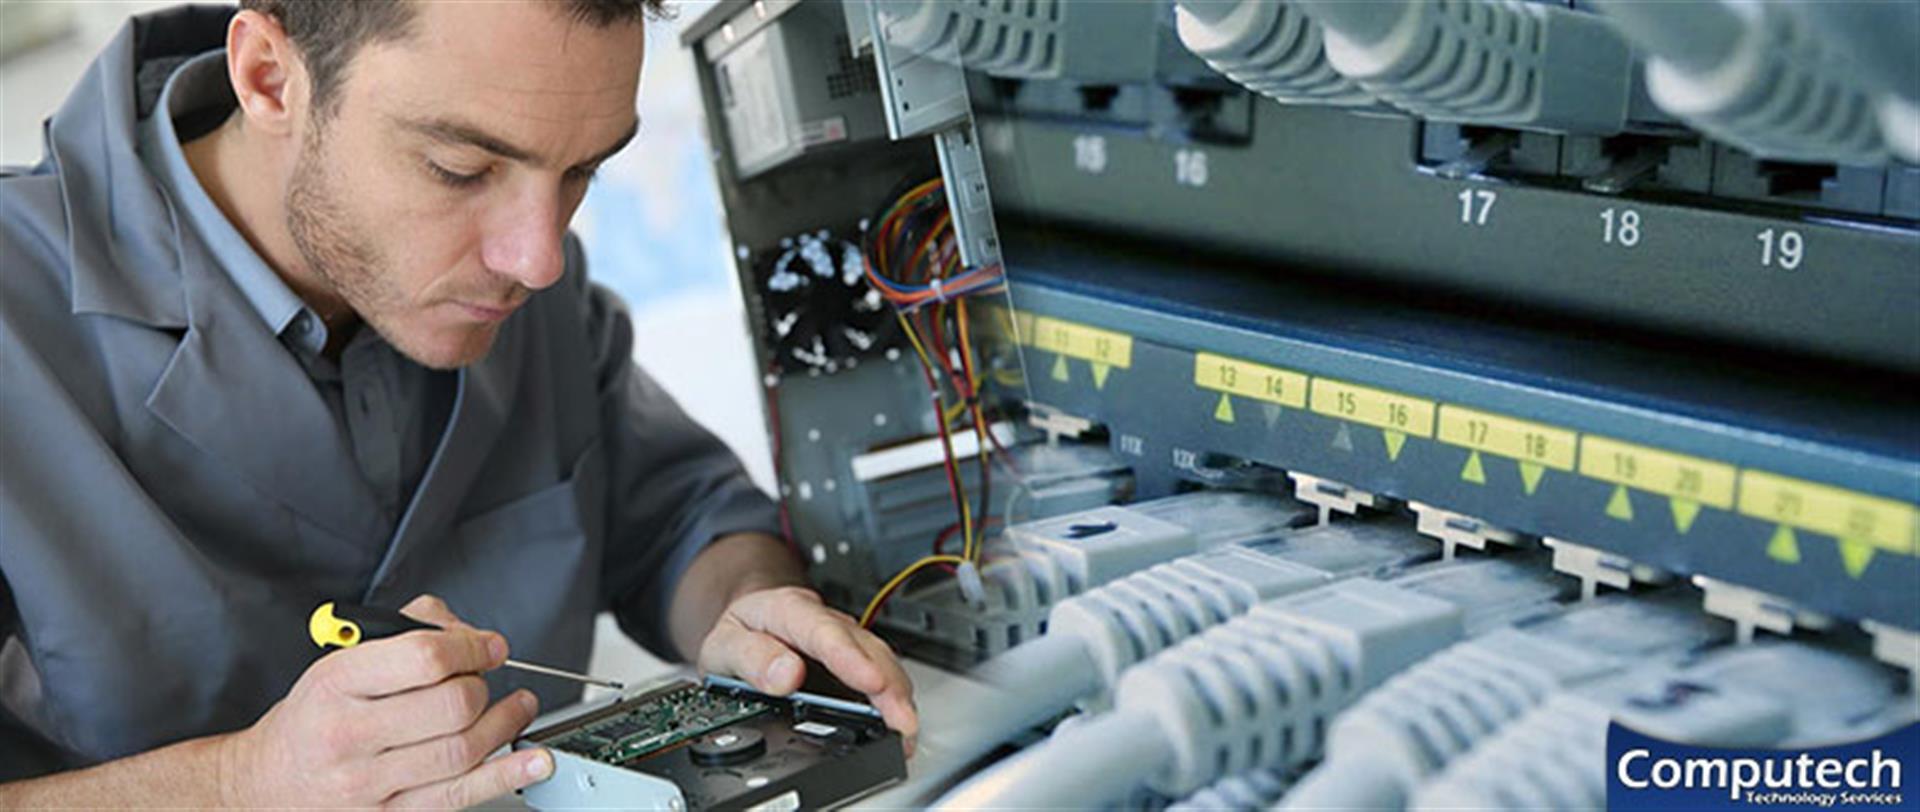 Bremen Georgia On Site Computer PC & Printer Repair, Networks, Voice & Data Cabling Services